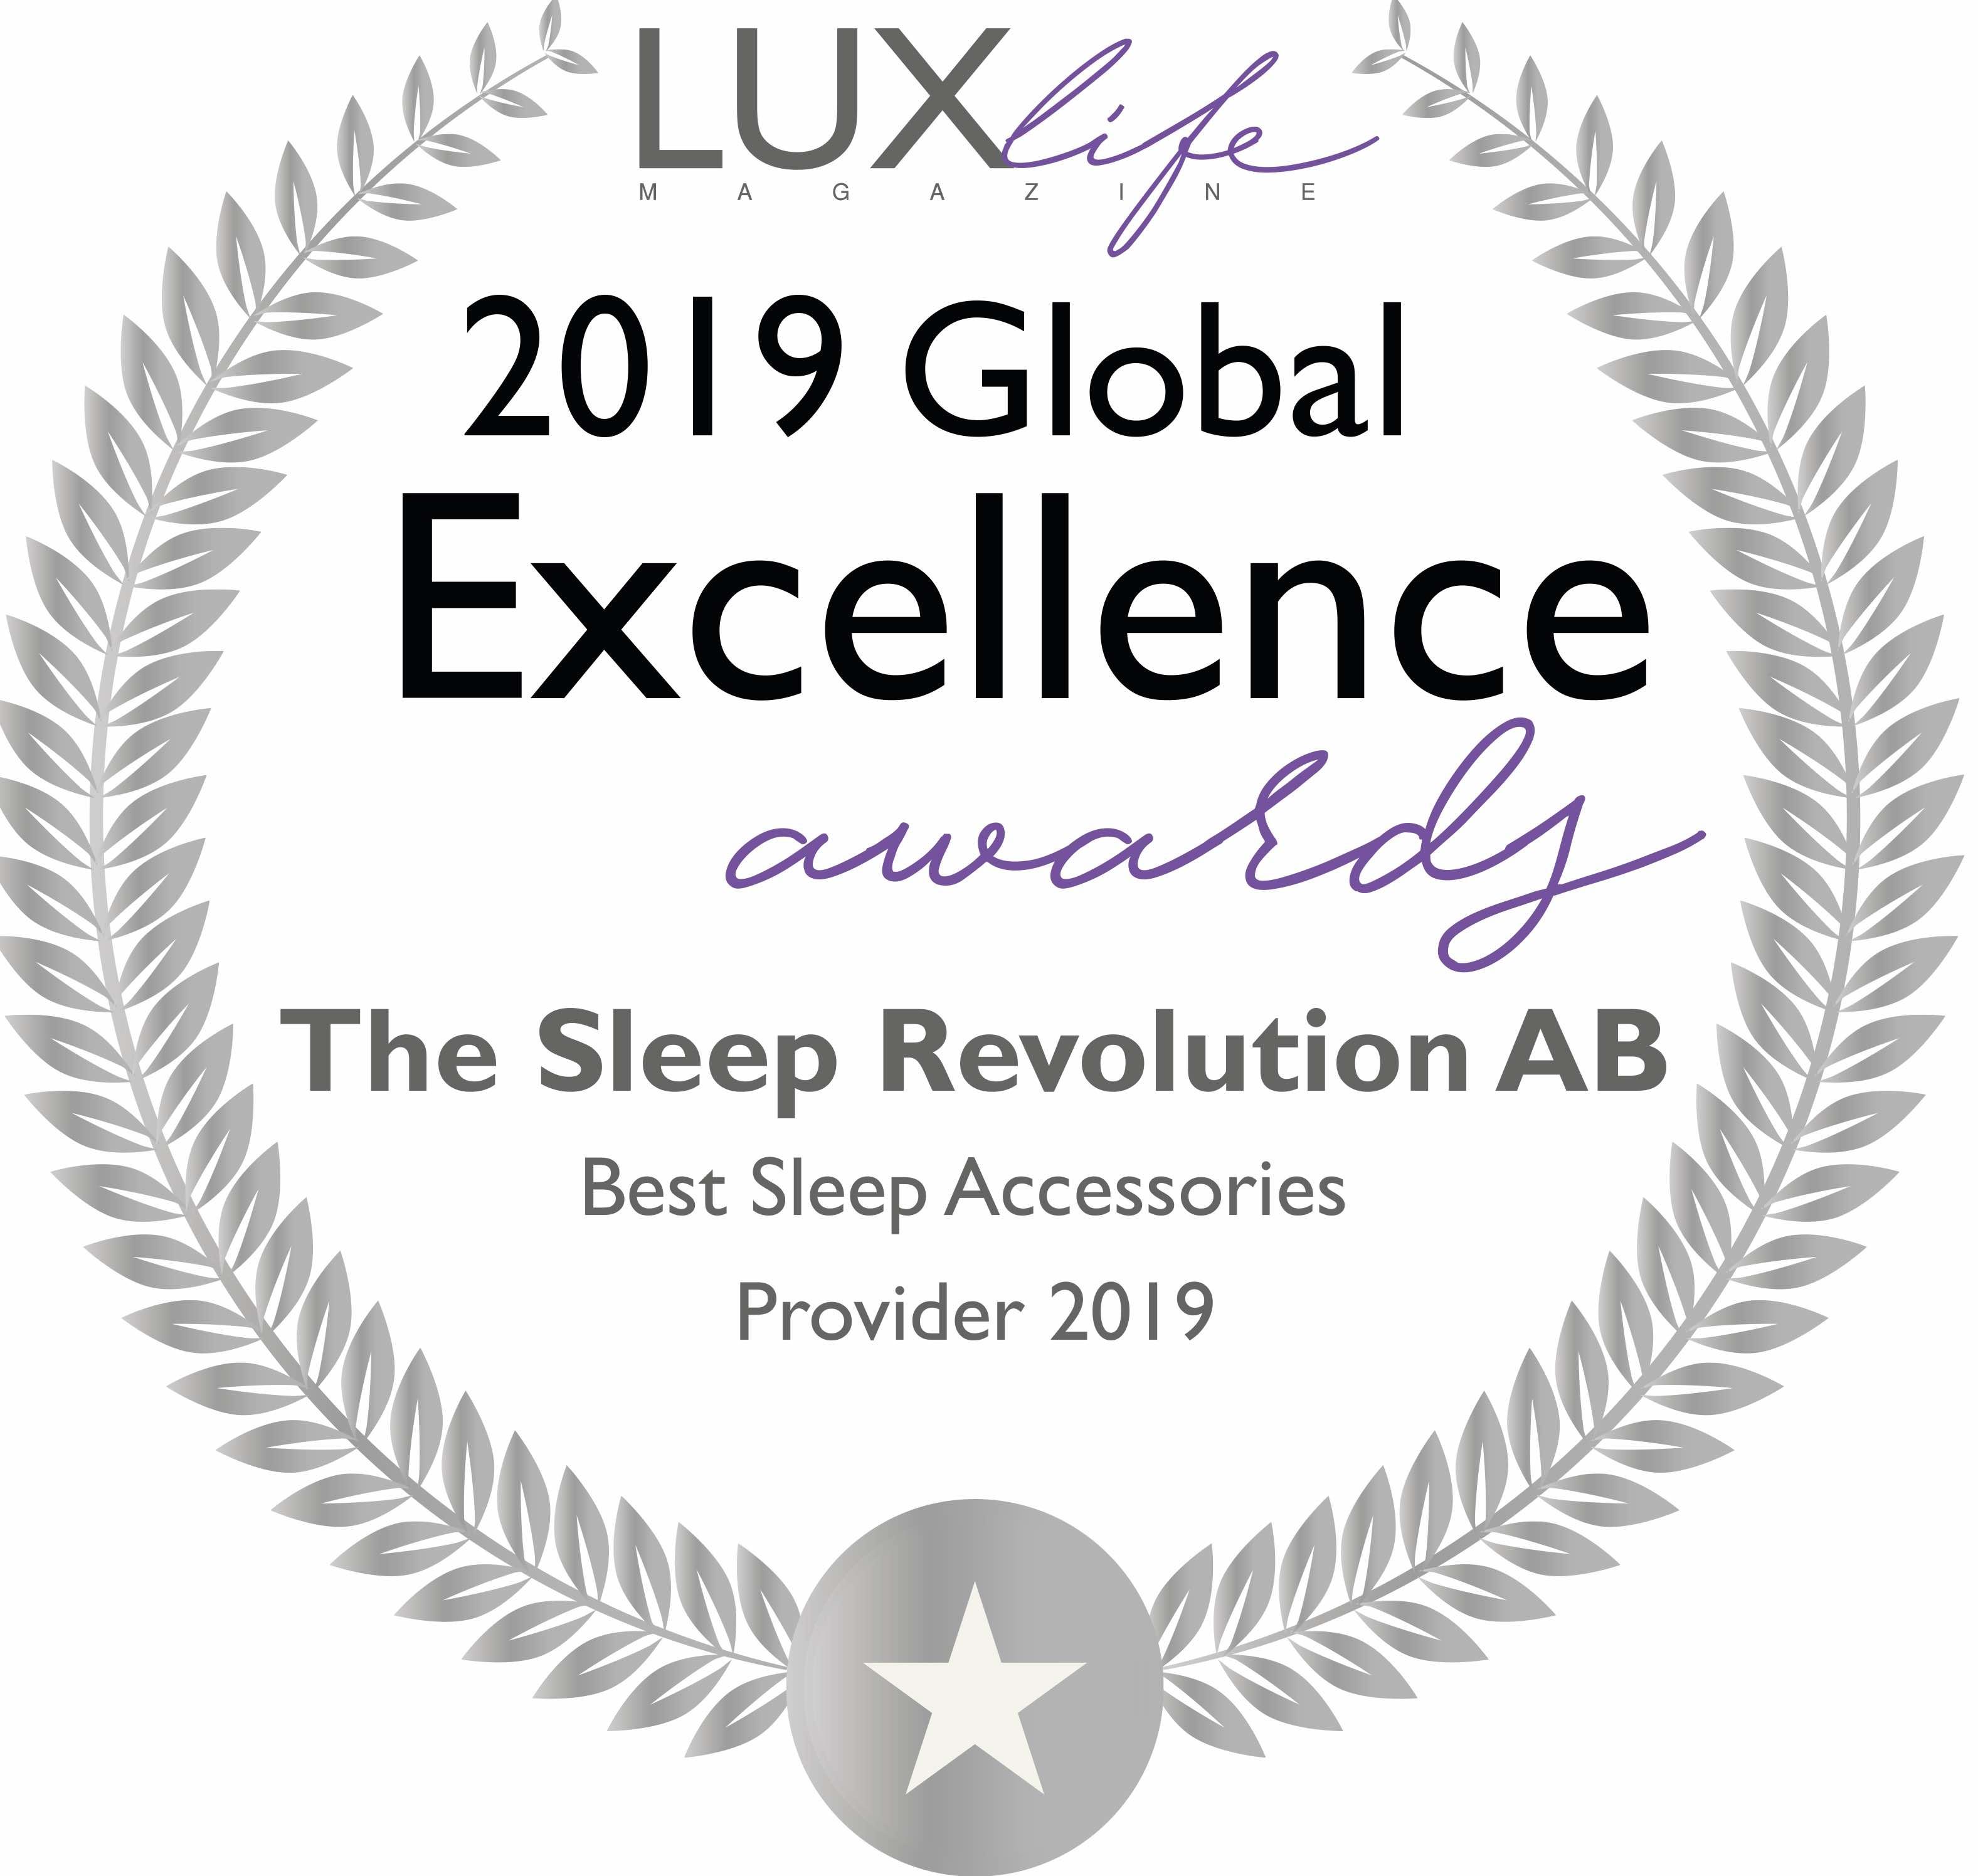 The Sleep Revolution AB